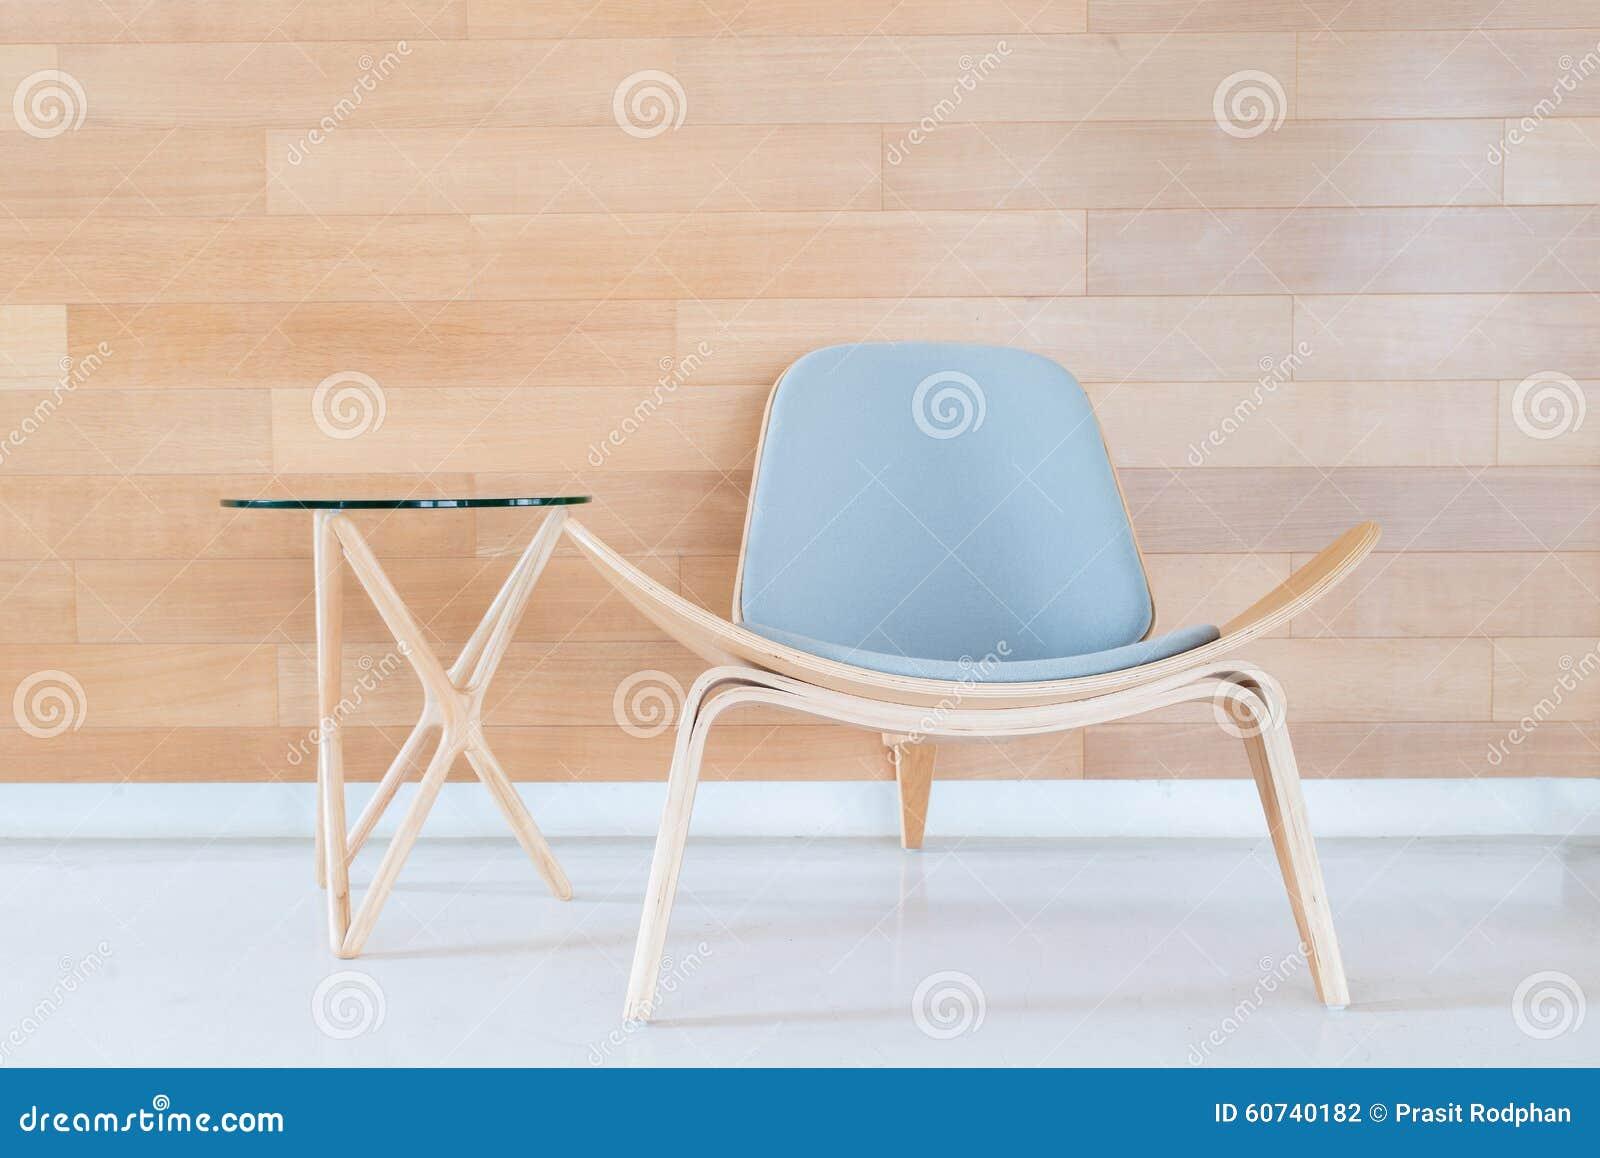 Moderne stoel en lijst met houten muur in woonkamer stock foto afbeelding 60740182 - Moderne stoel ...